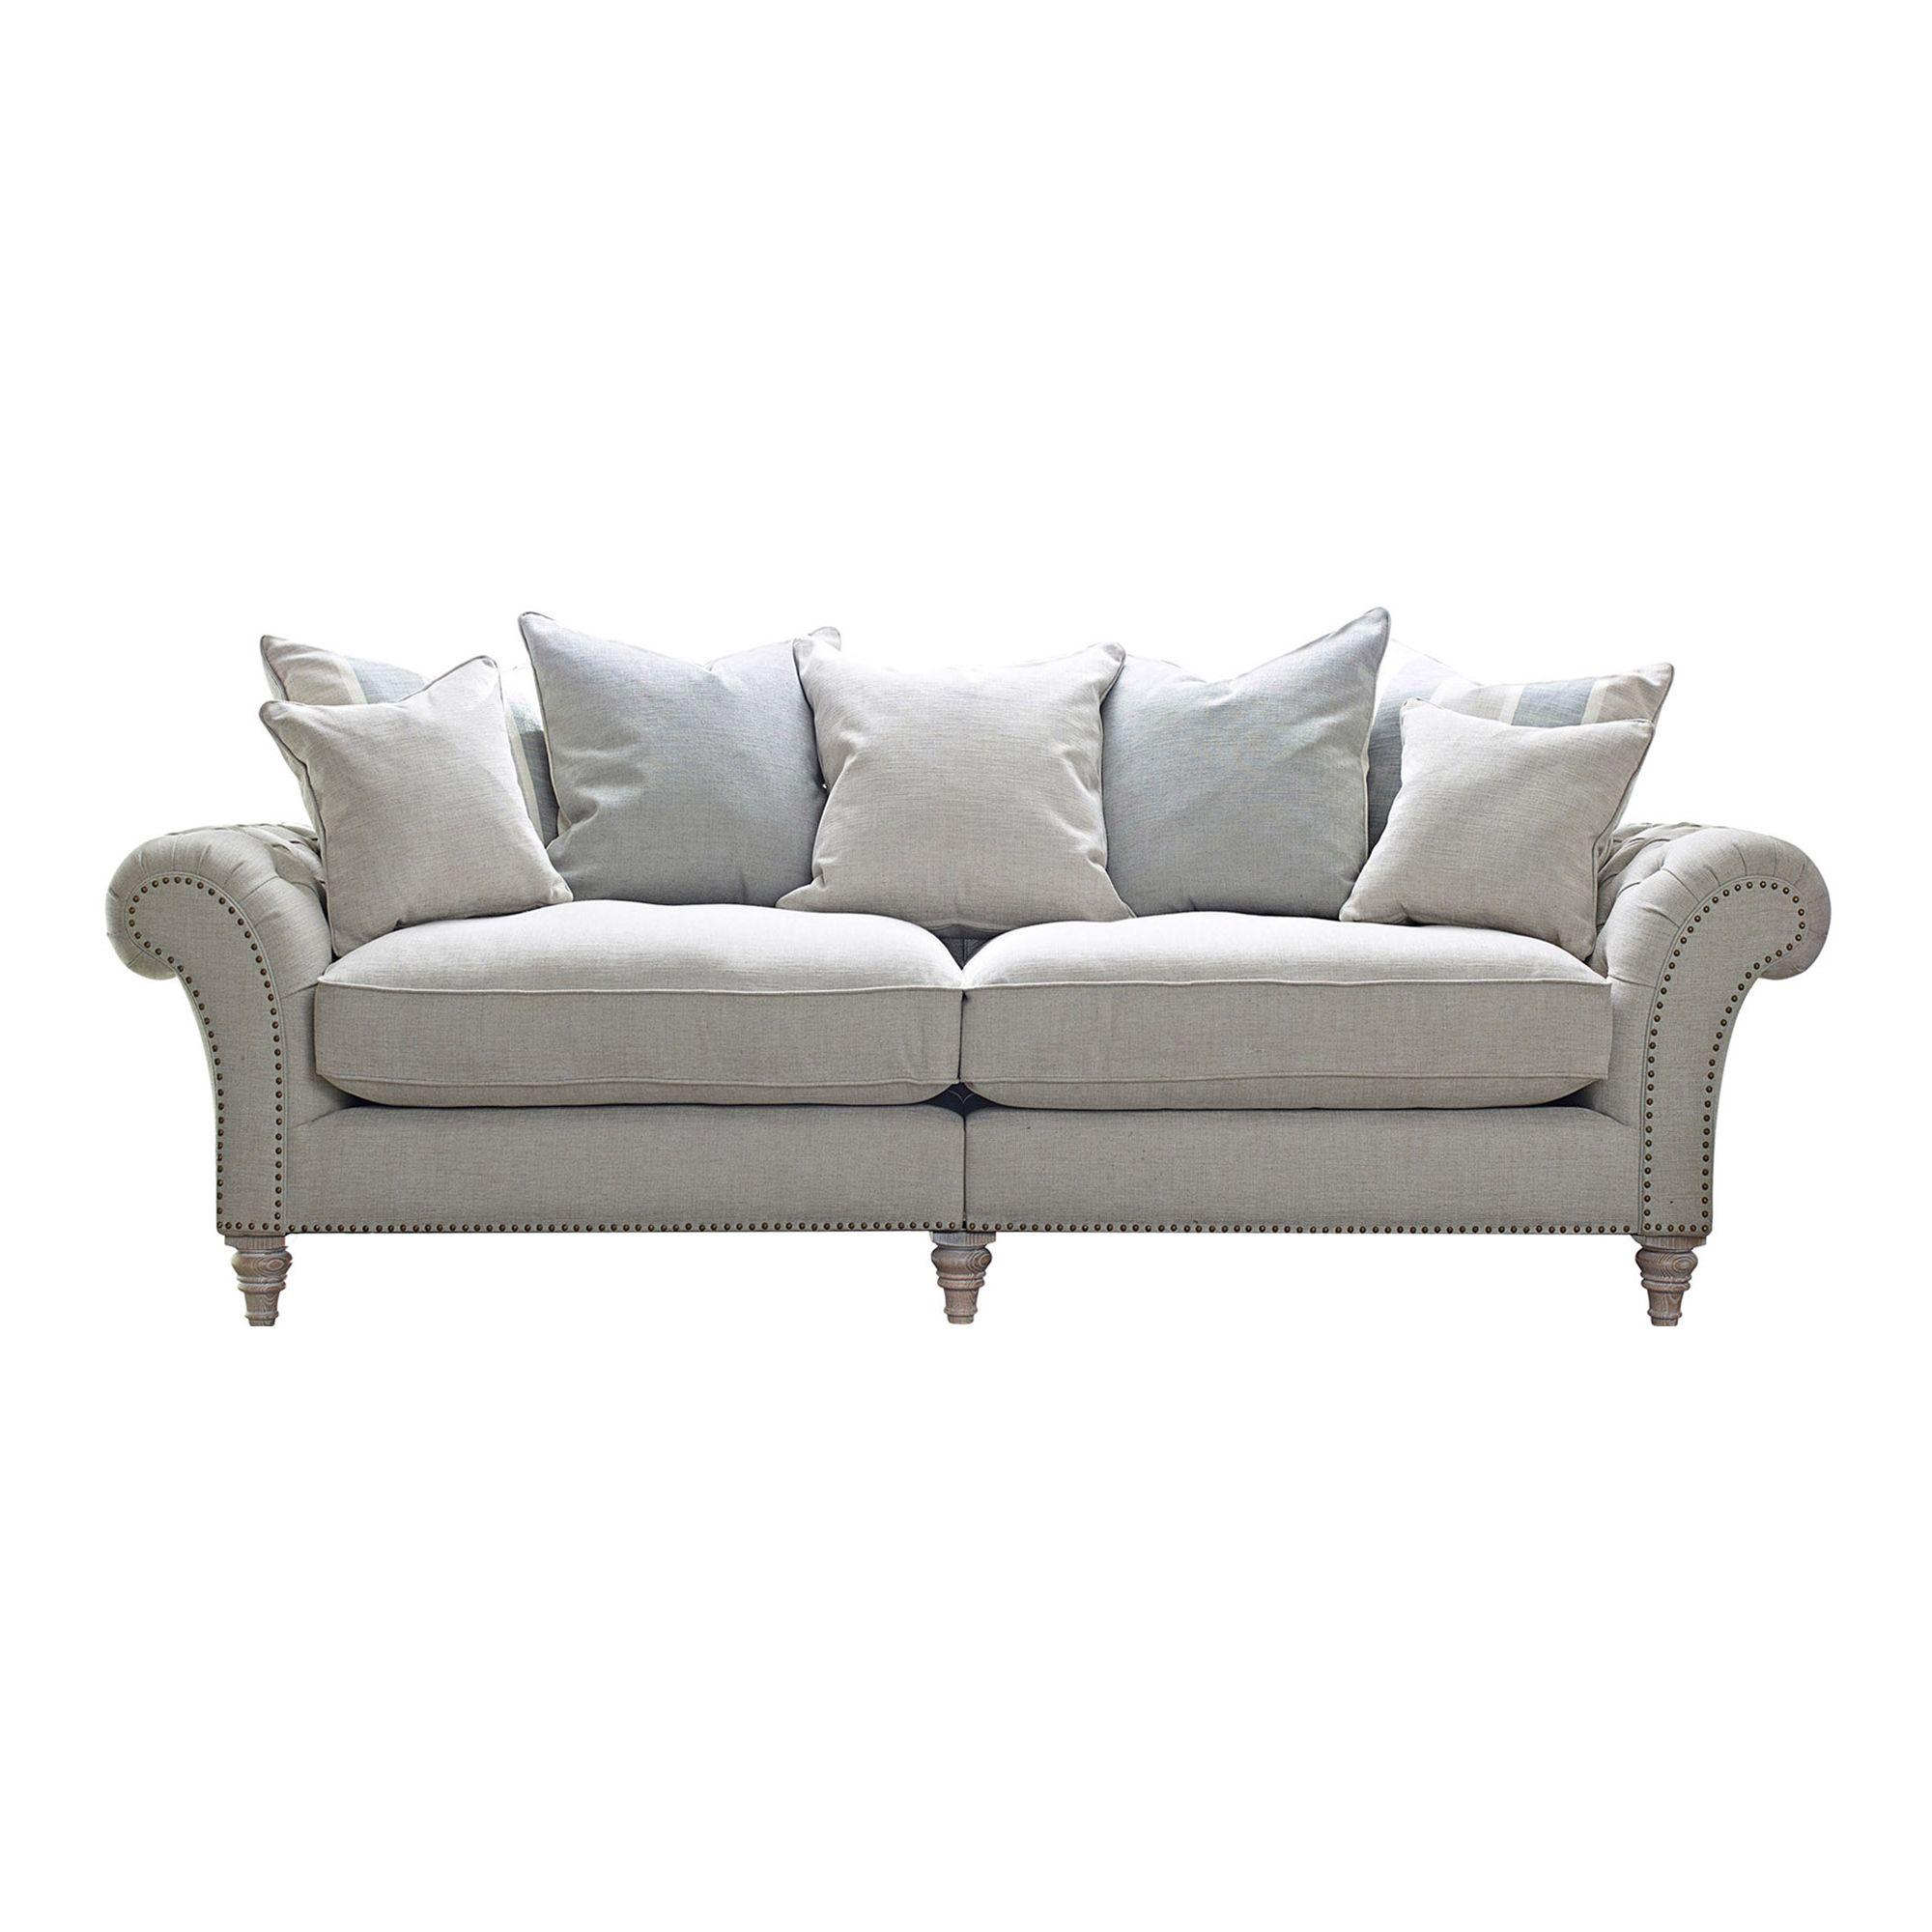 Westbridge Cabana 4 Seater Scatter Back Sofa Fabric B All Sofa  # Meubles Cafe Kilkenny